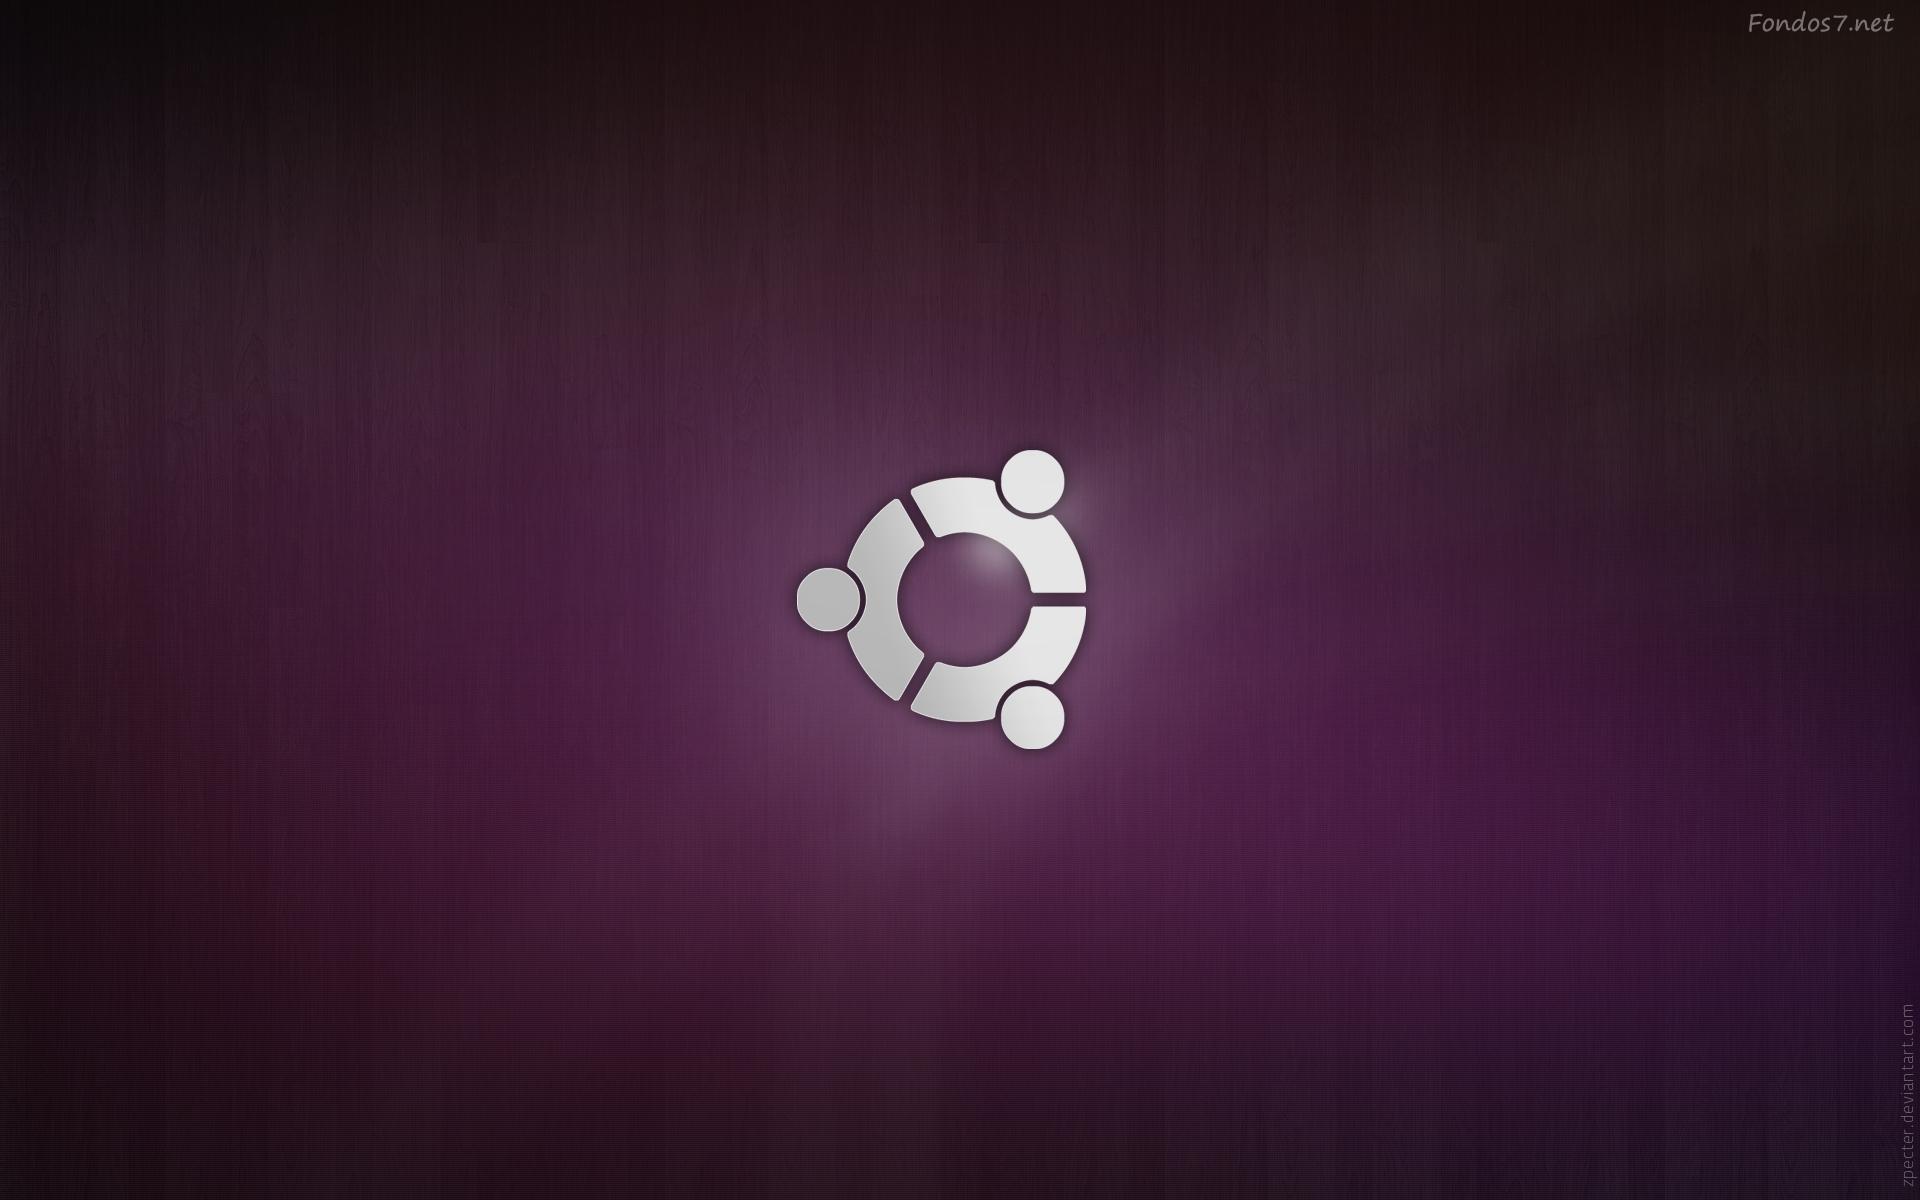 Ubuntu Wallpapers Hd 36531 1920x1200